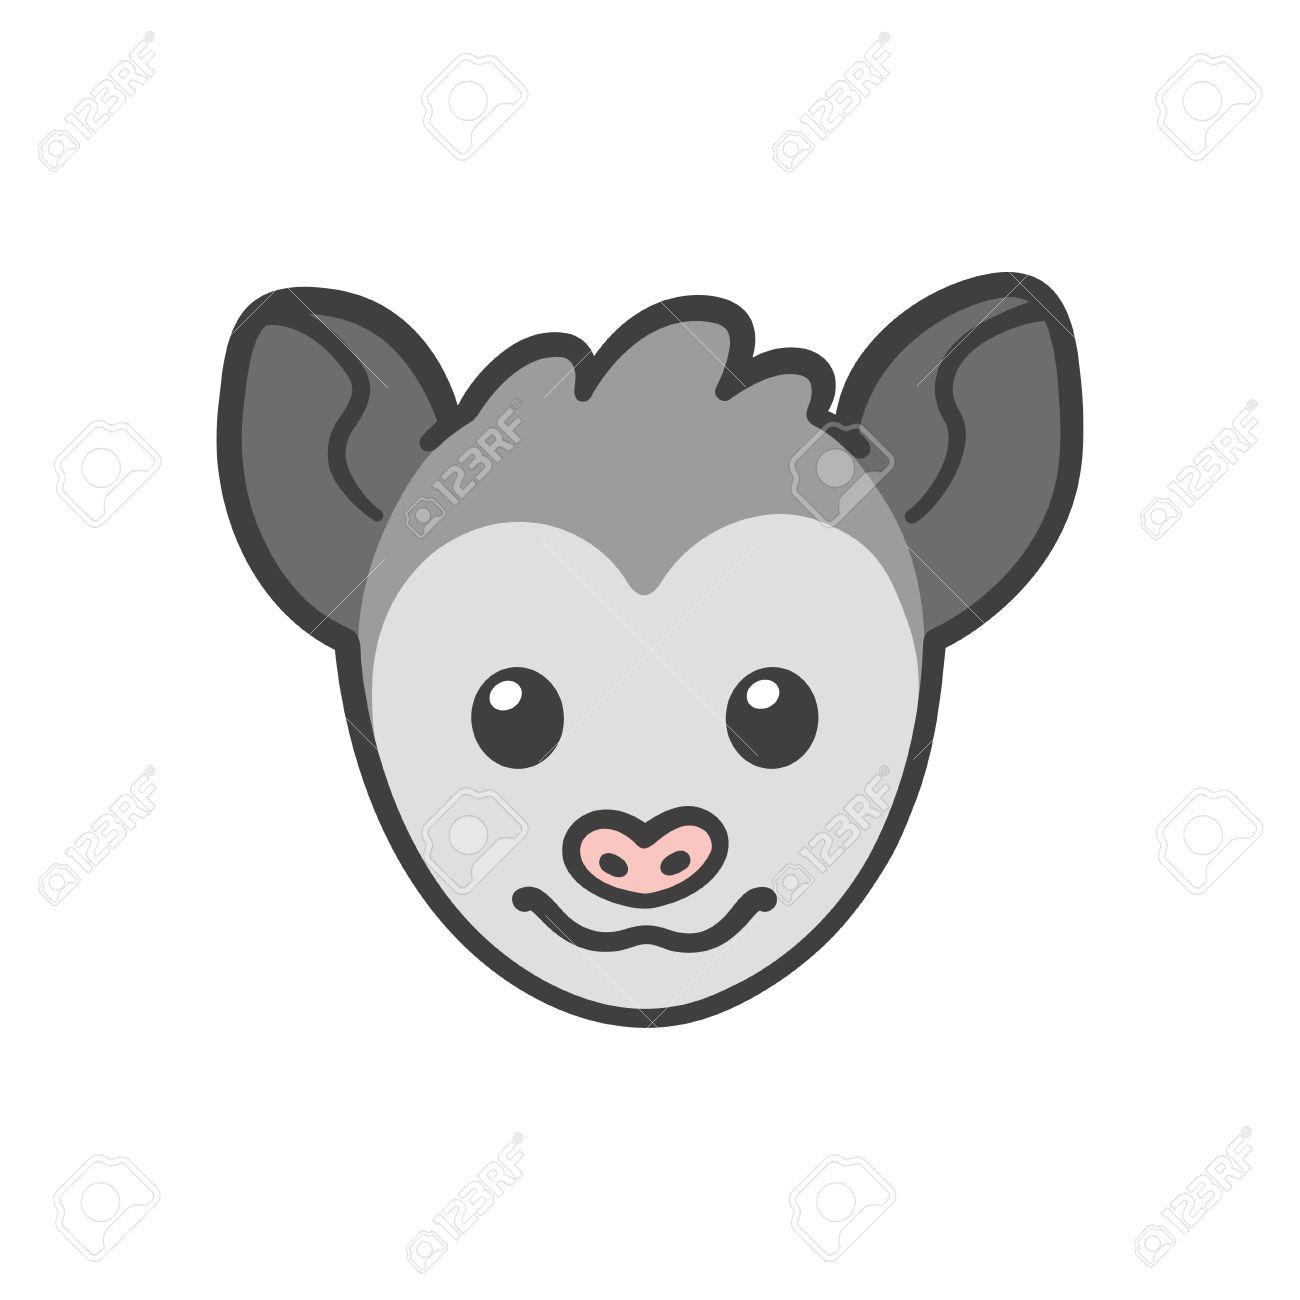 Cute Cartoon Smiling Possum Head, Funny Animal Drawing. Royalty ...